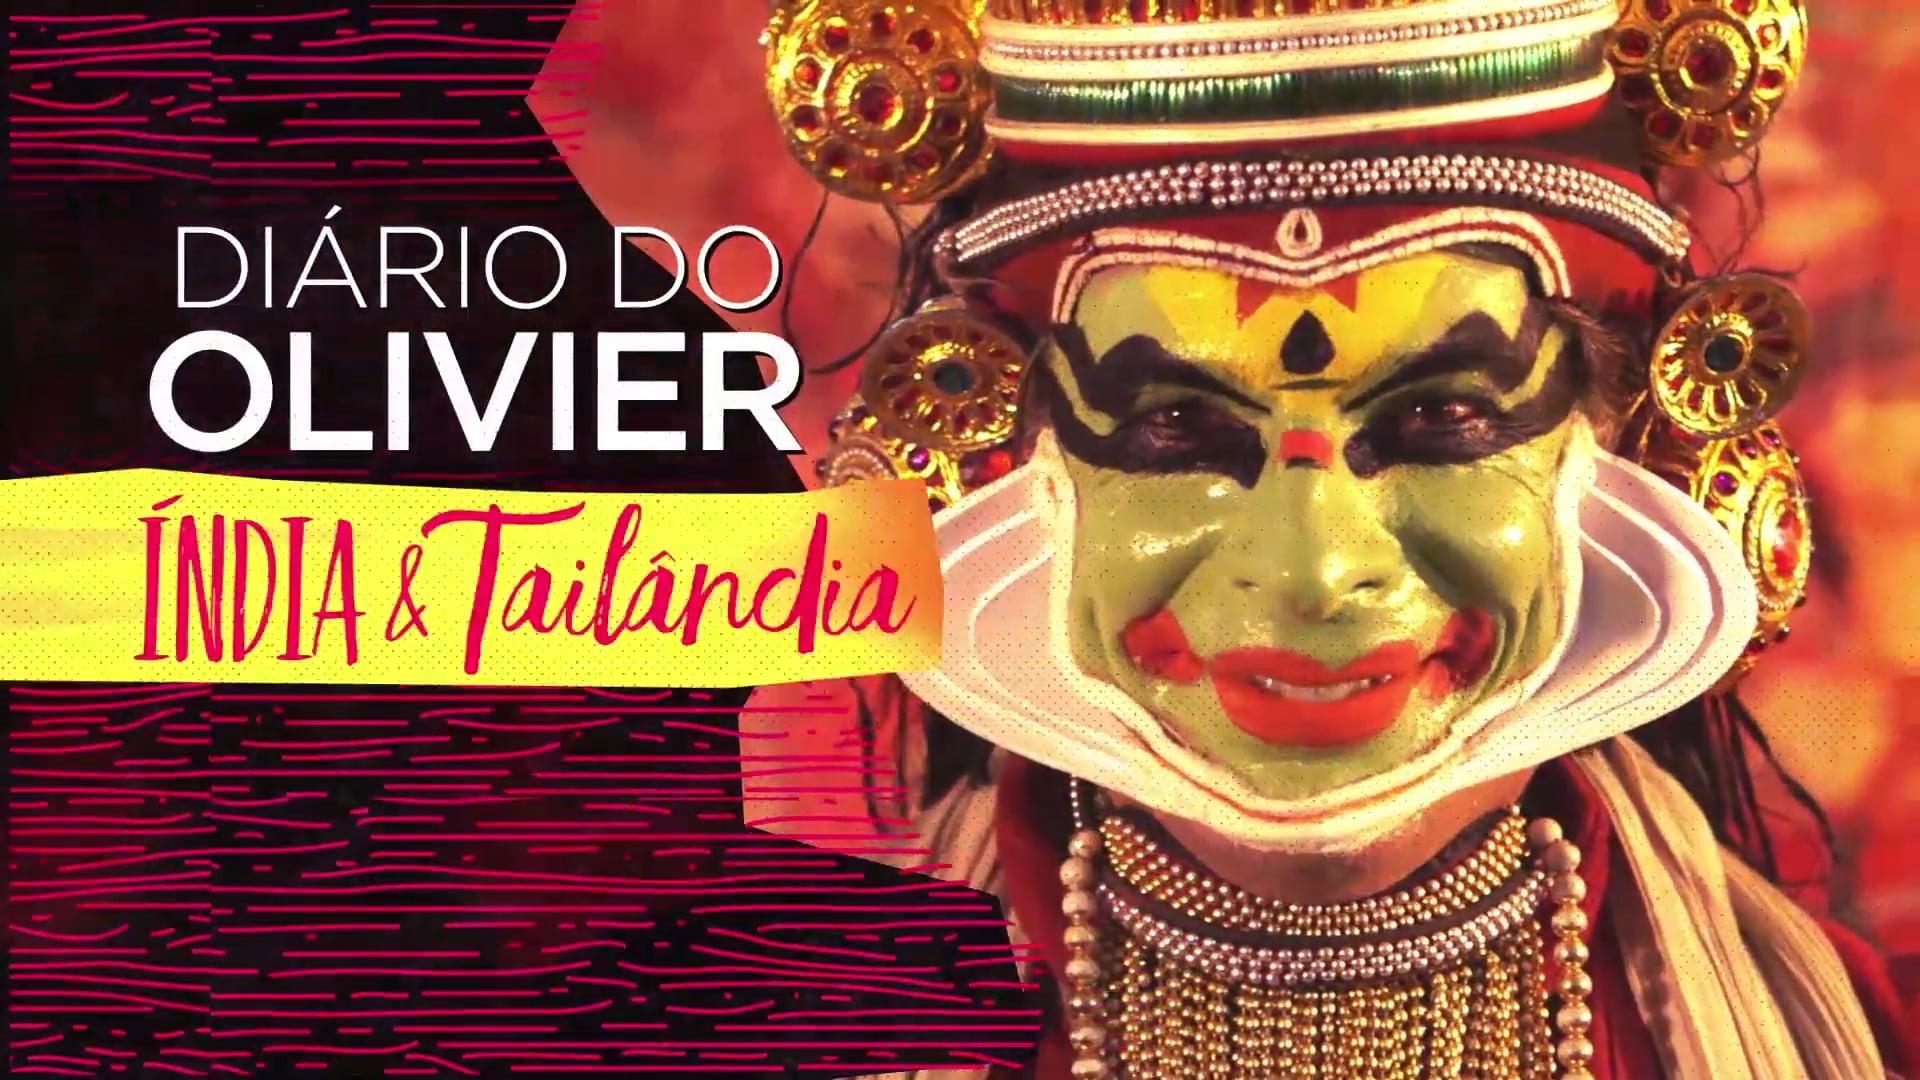 Diario do Olivier_INDIA